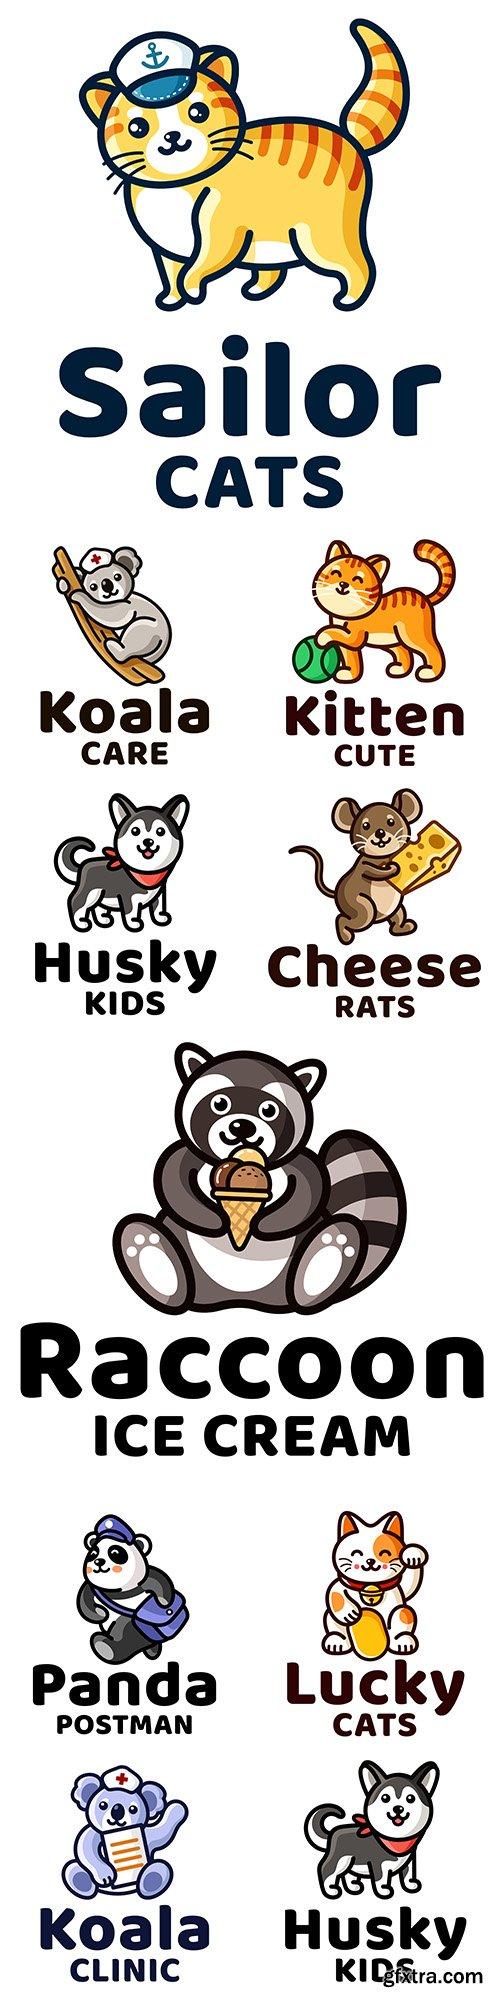 Fun animal design logo template for children